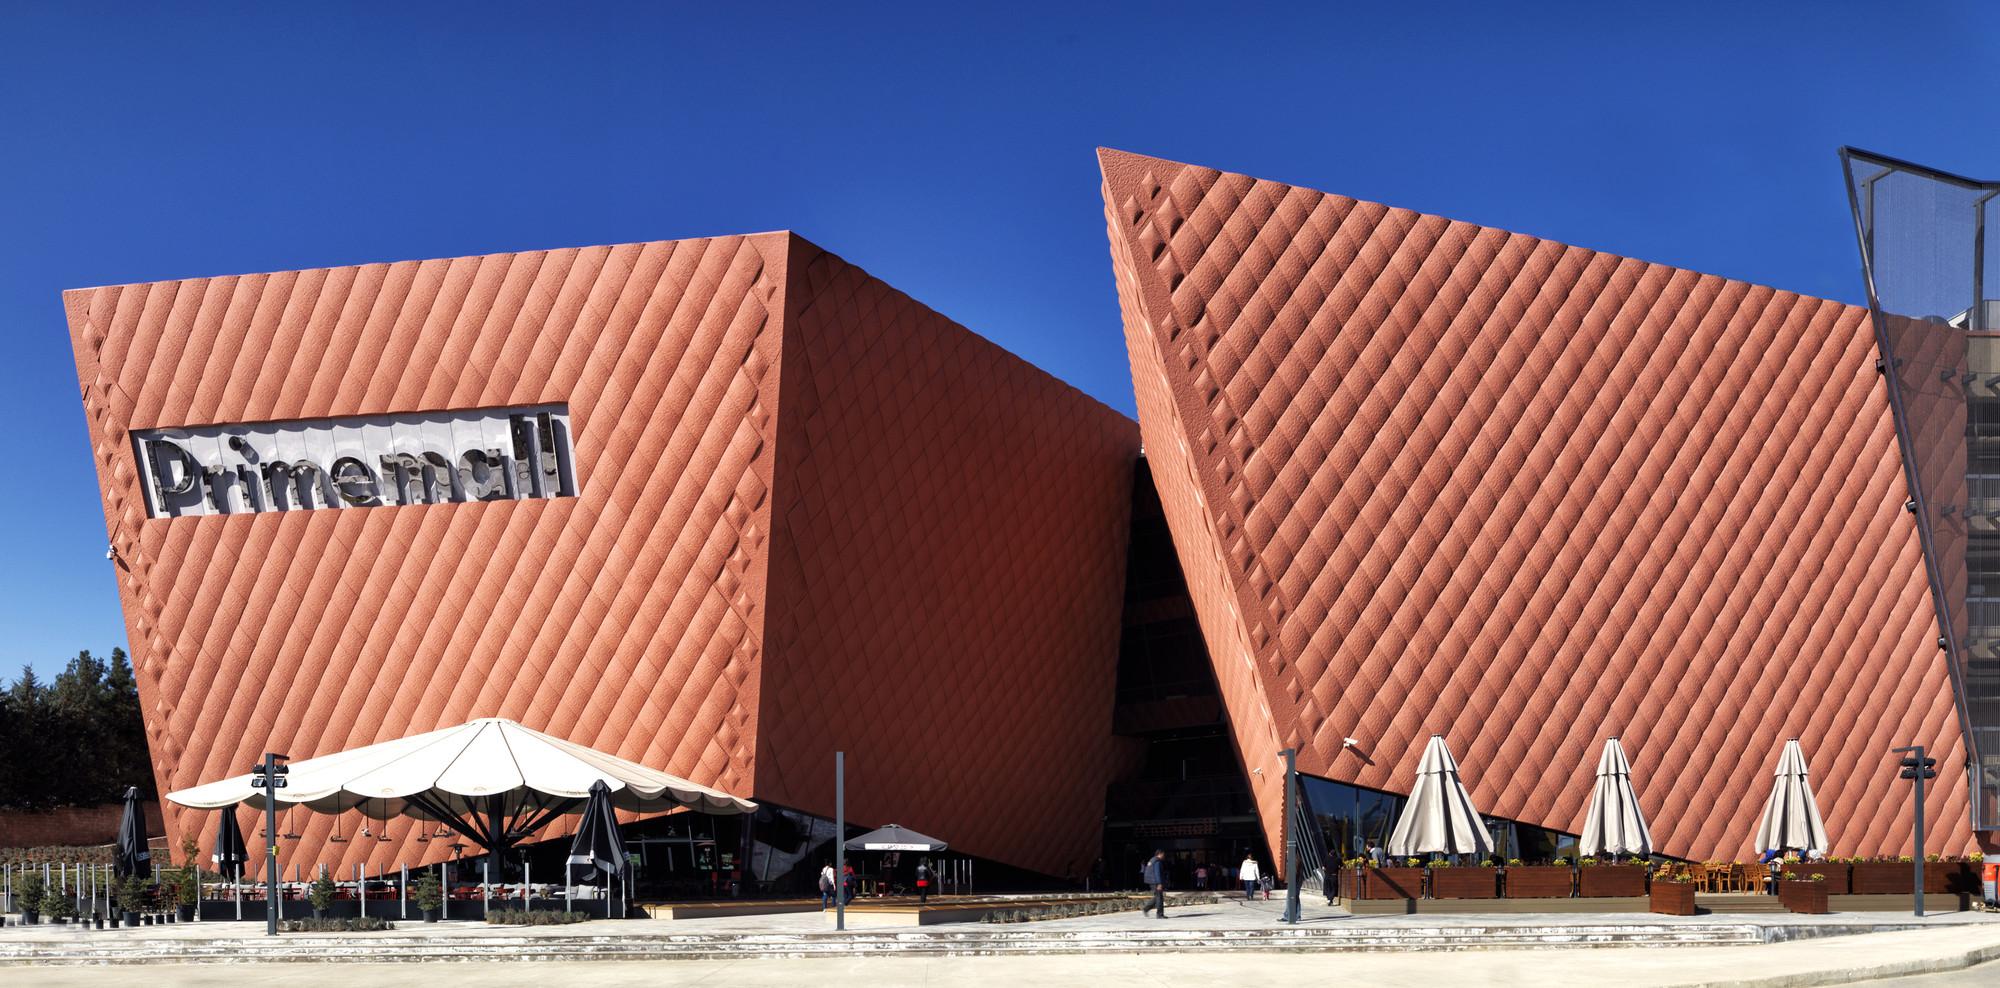 Gaziantep Shopping Center / Erginoğlu & Çalışlar Architects, © Cemal Emden